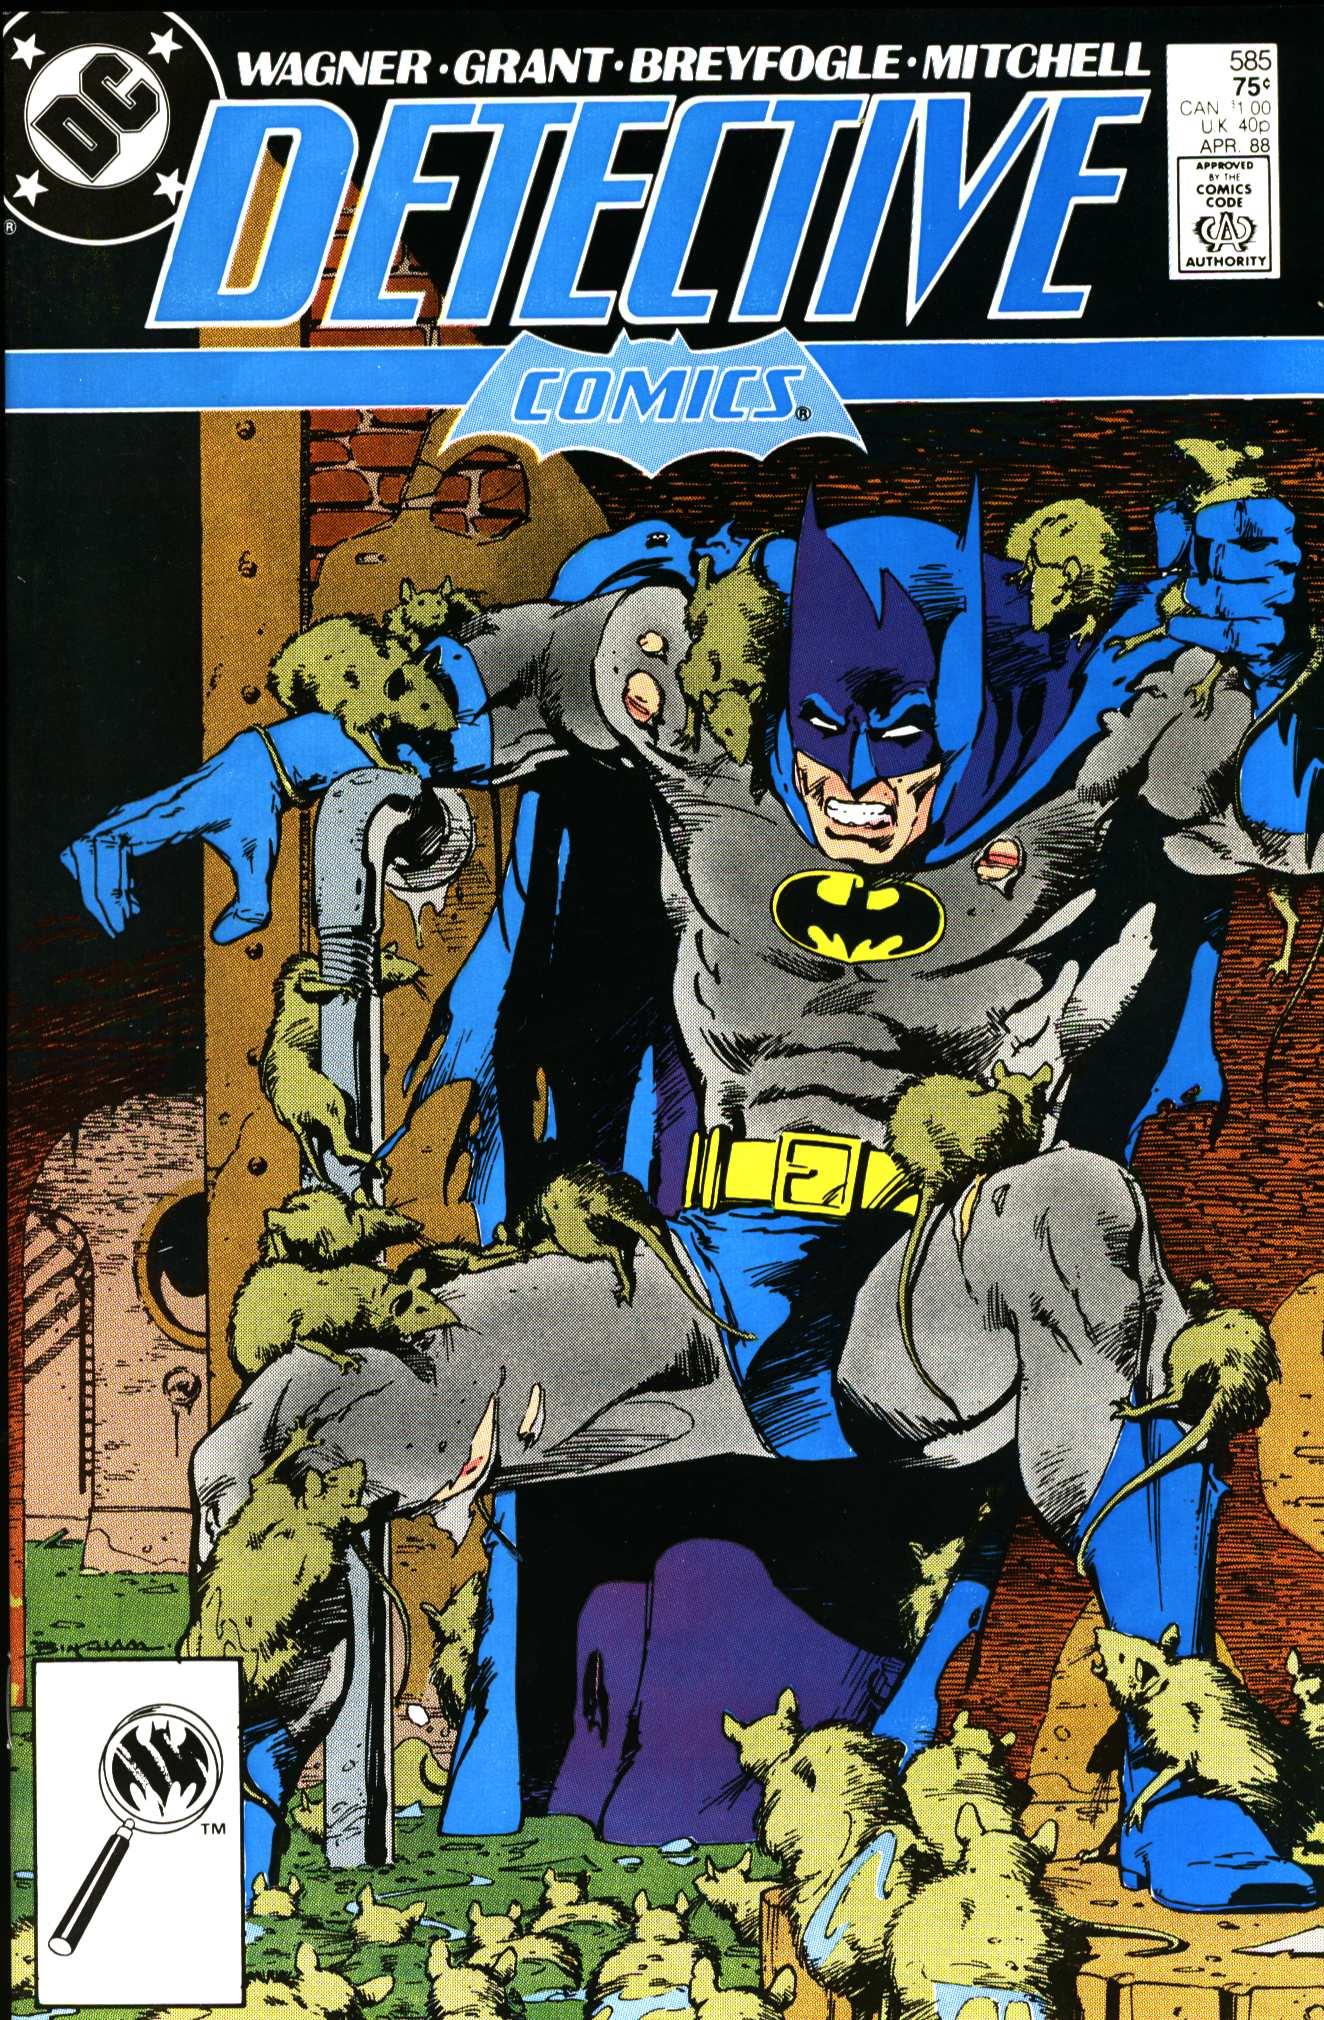 Detective Comics (1937) 585 Page 1